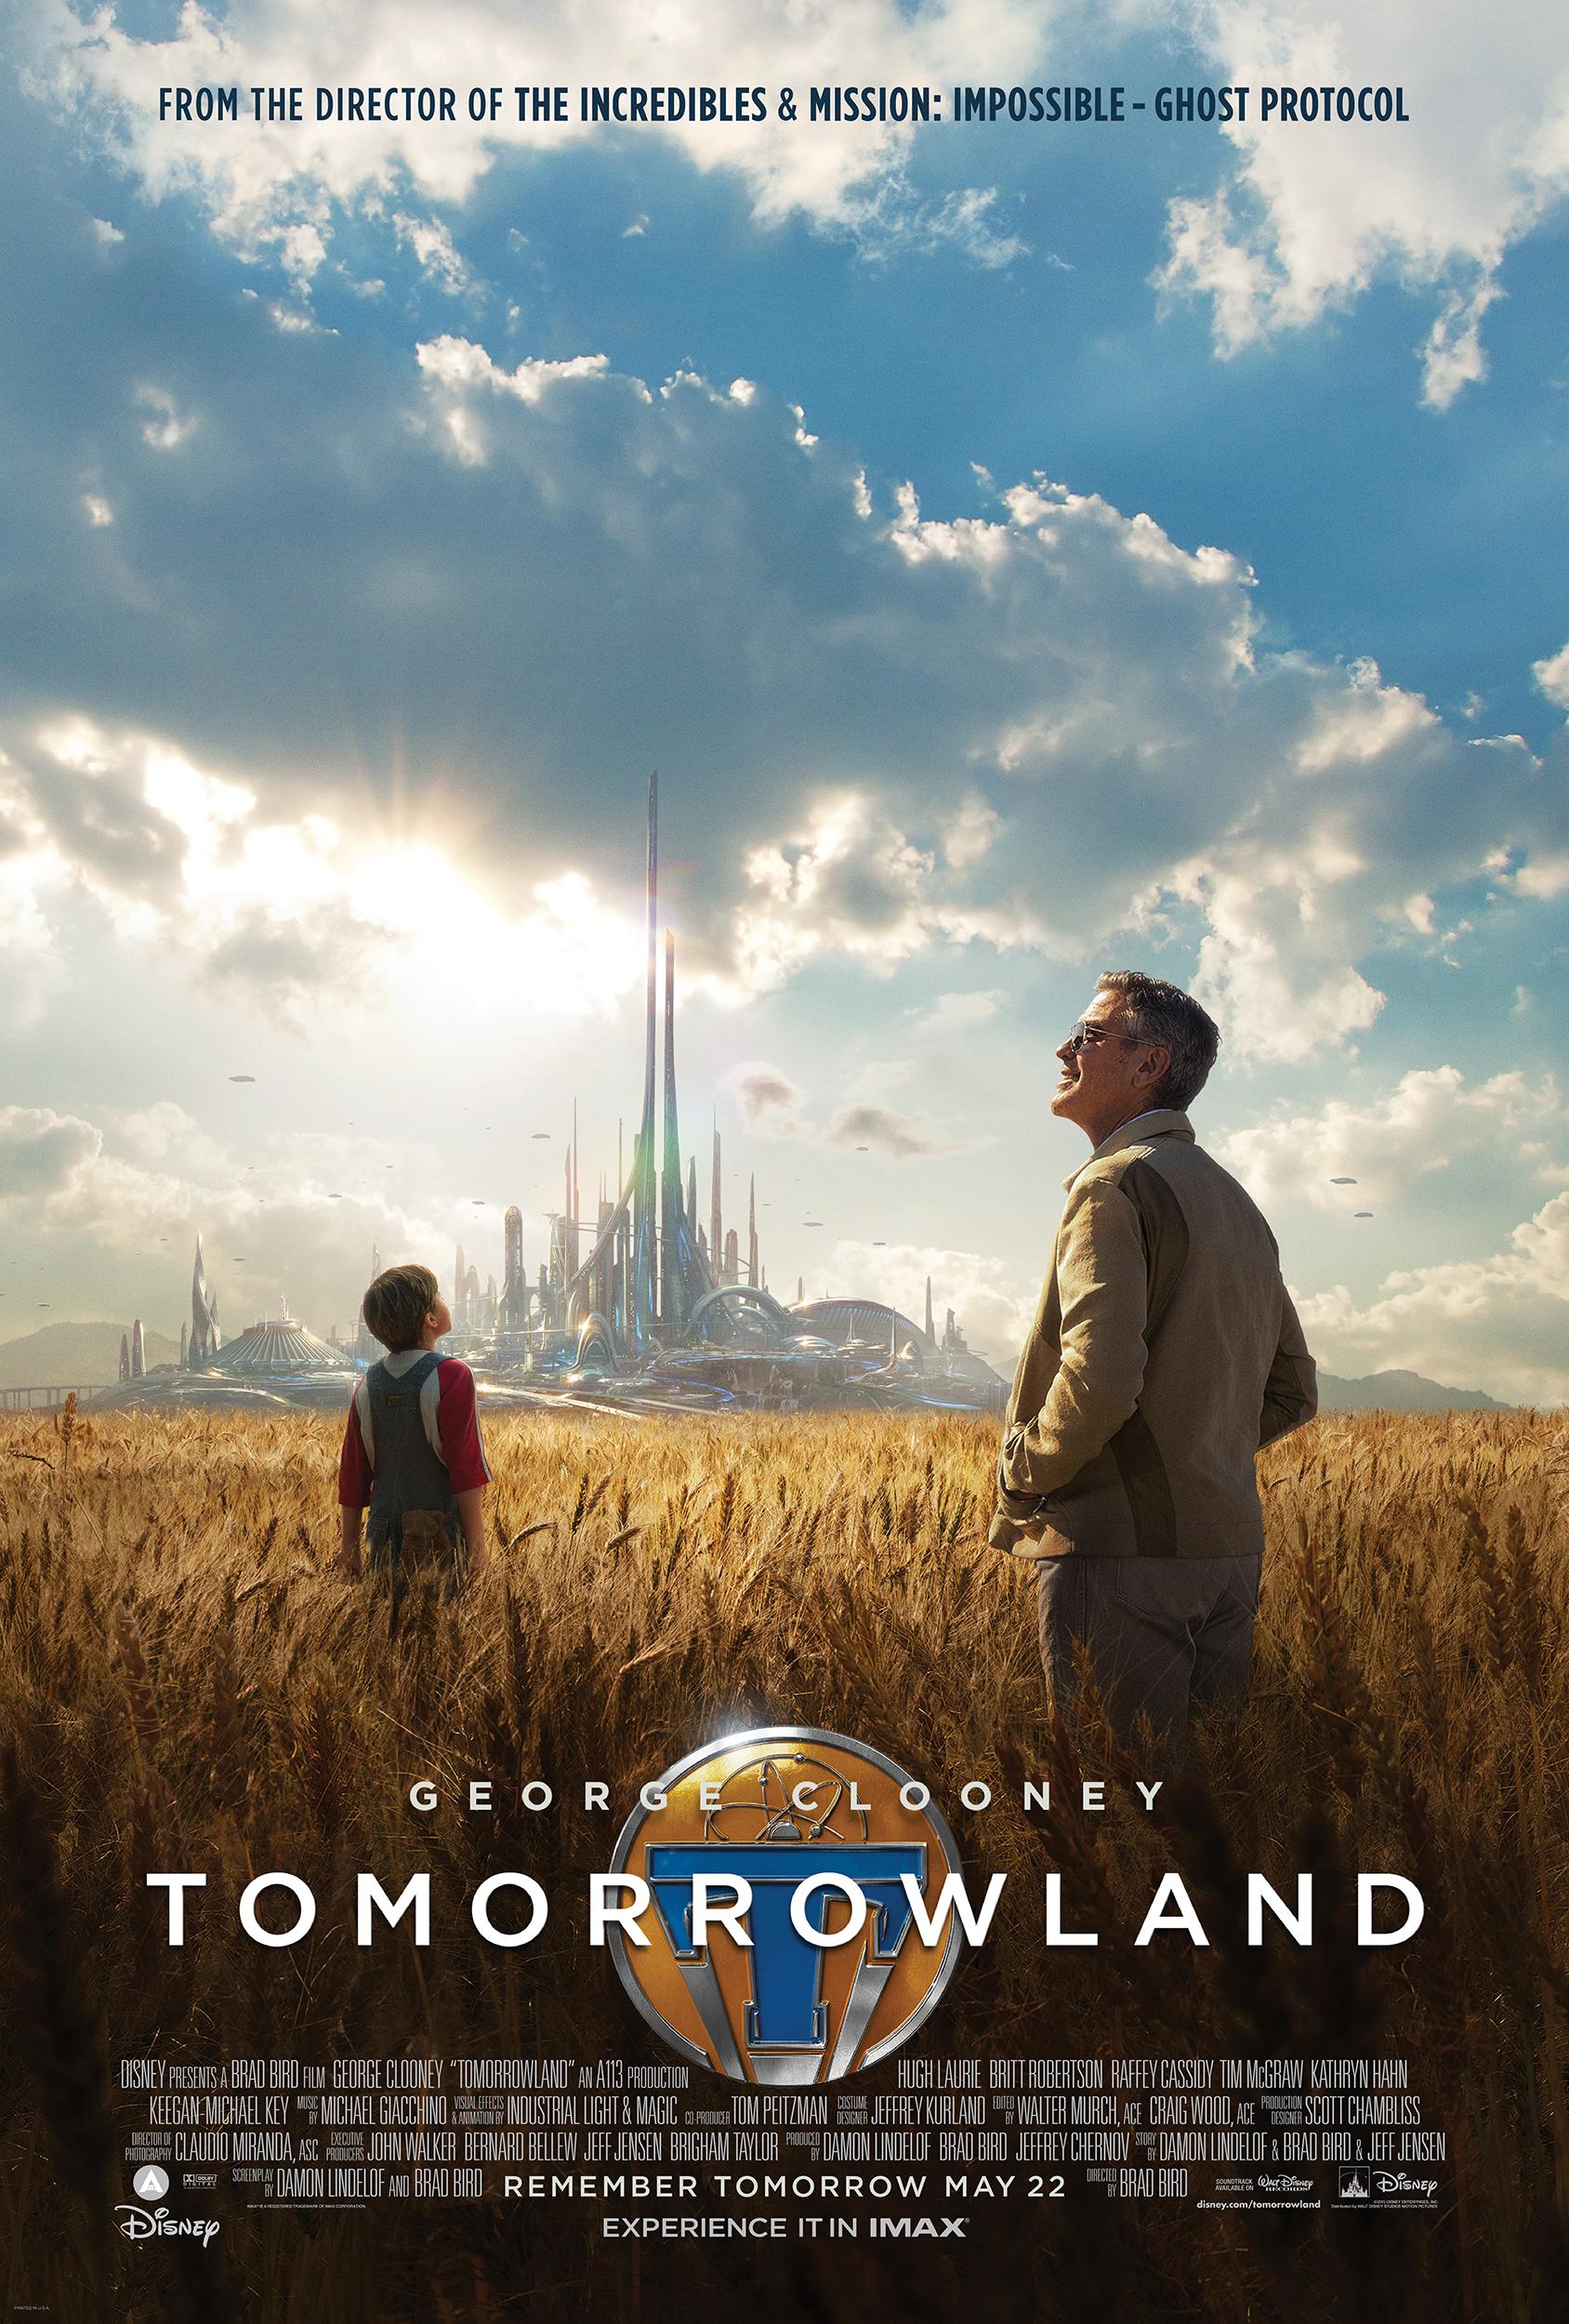 tomorrowland-poster-george-clooney1.jpg